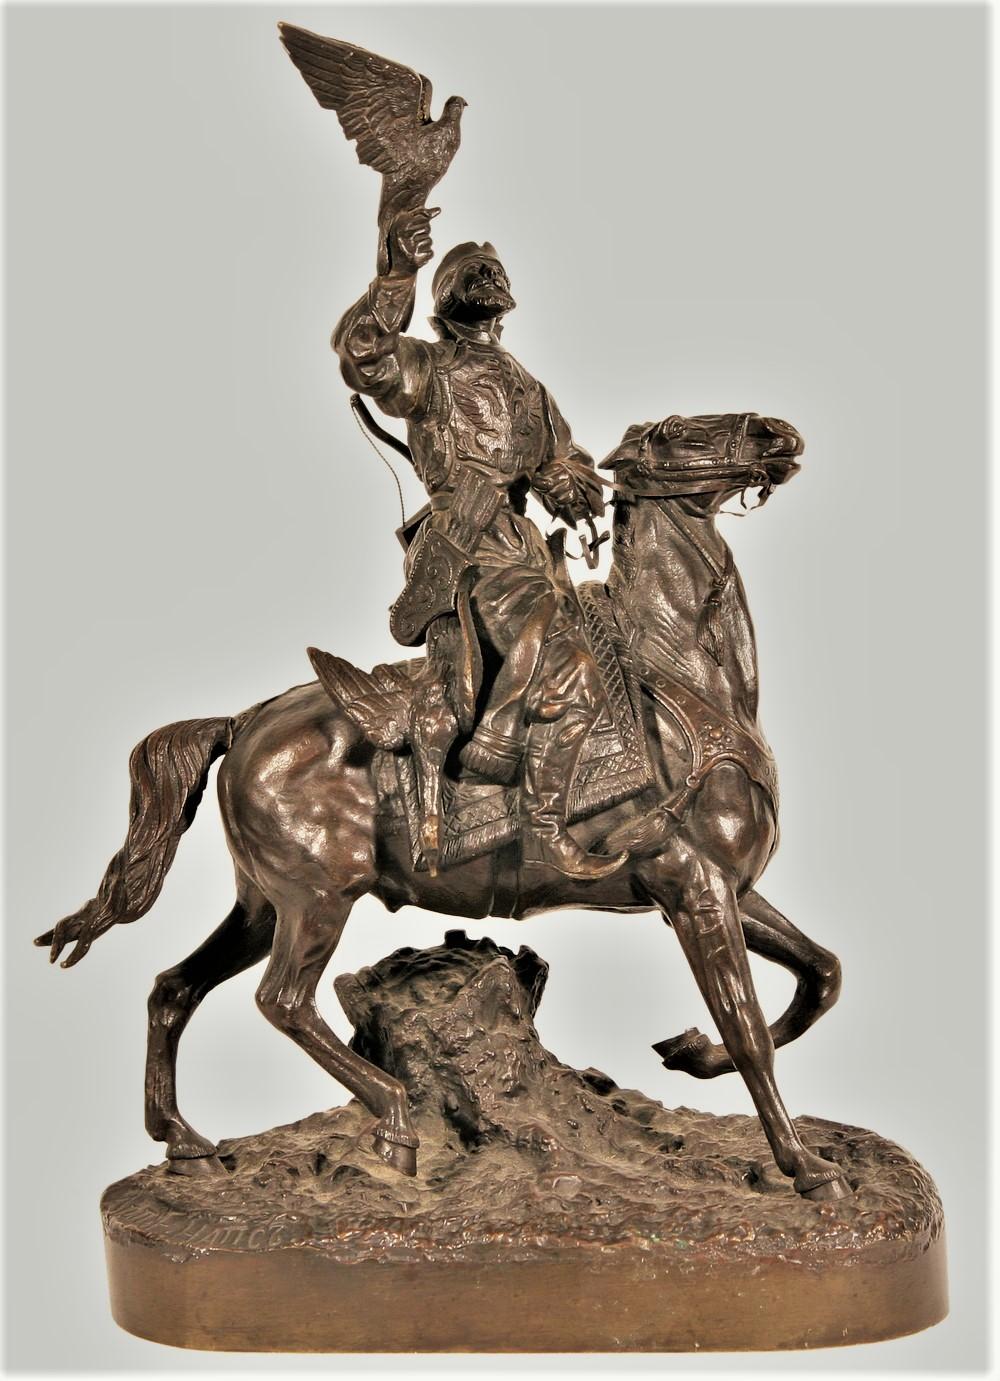 eugeny-naps - falconer-bronze-russian-naps-statue